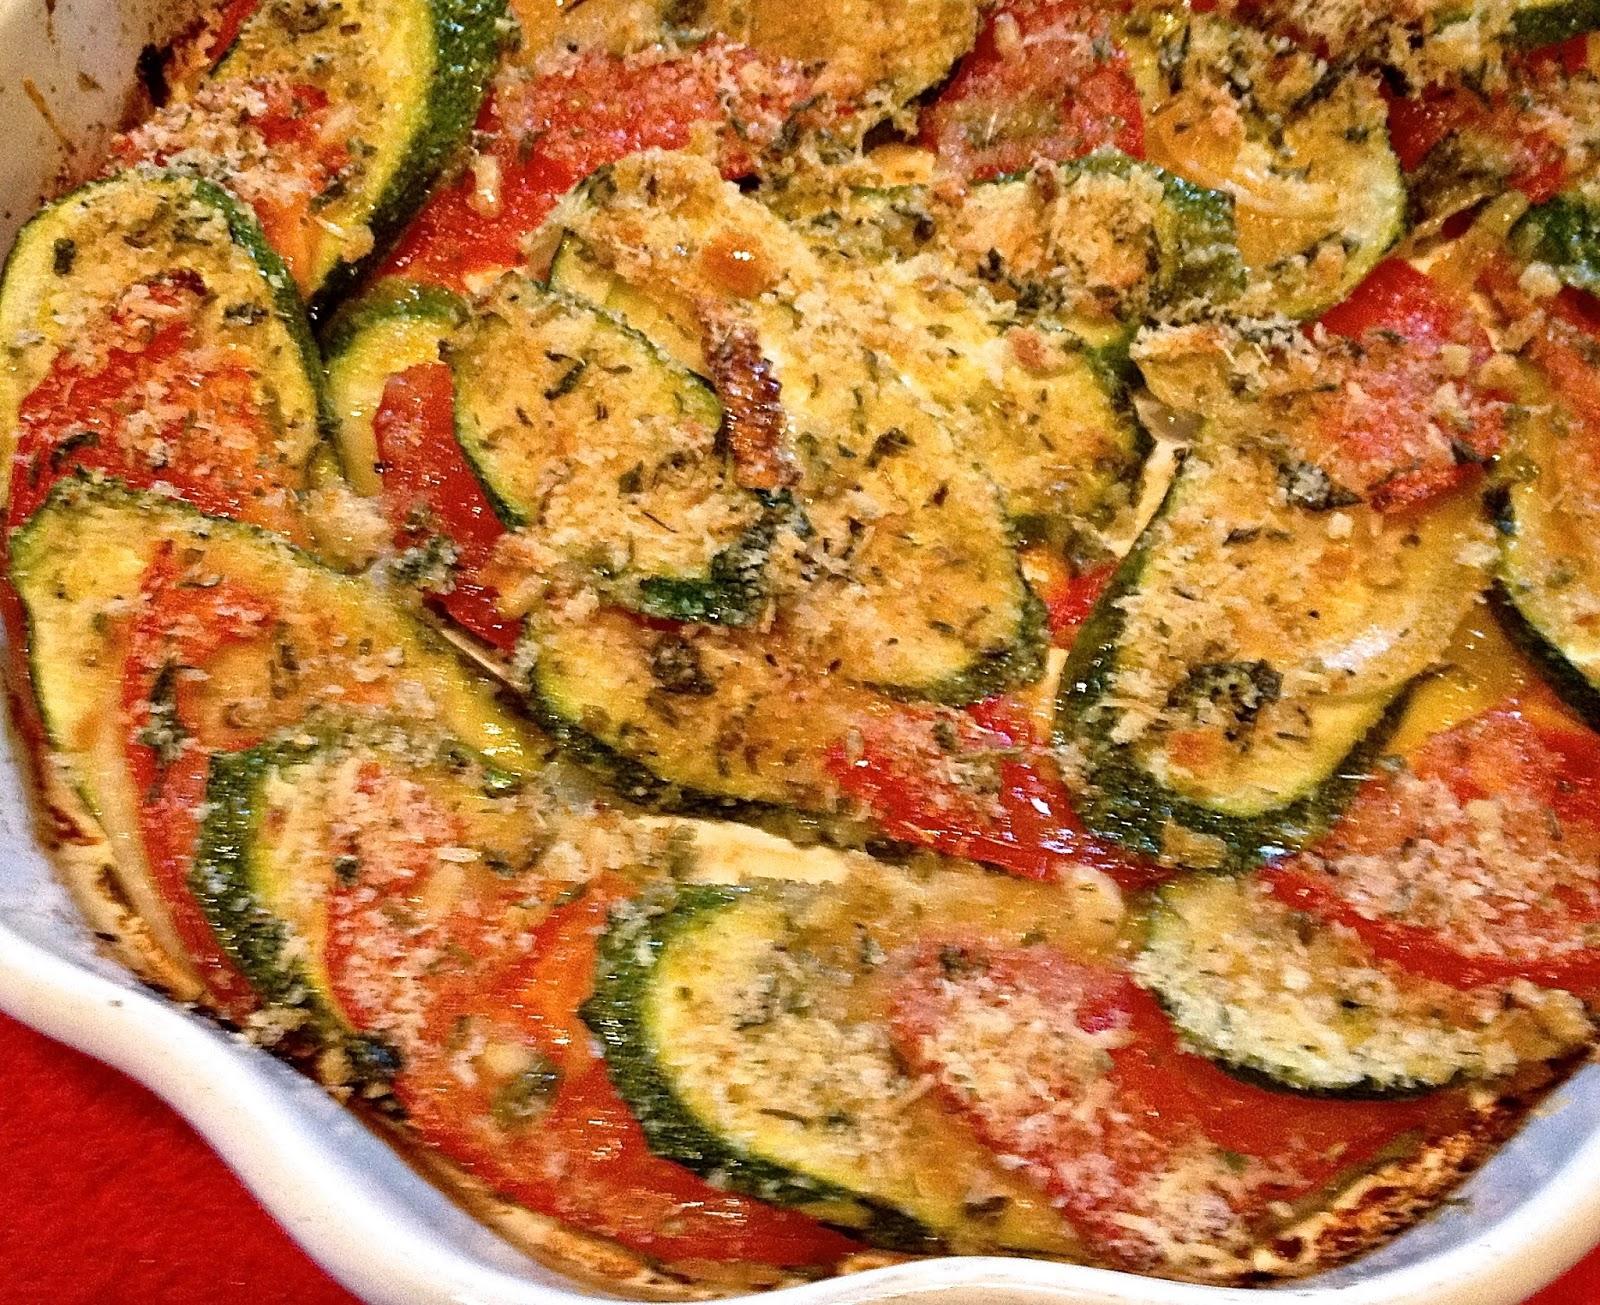 tomatoes au gratin scalloped eggplant and tomato gratin tomato gratin ...